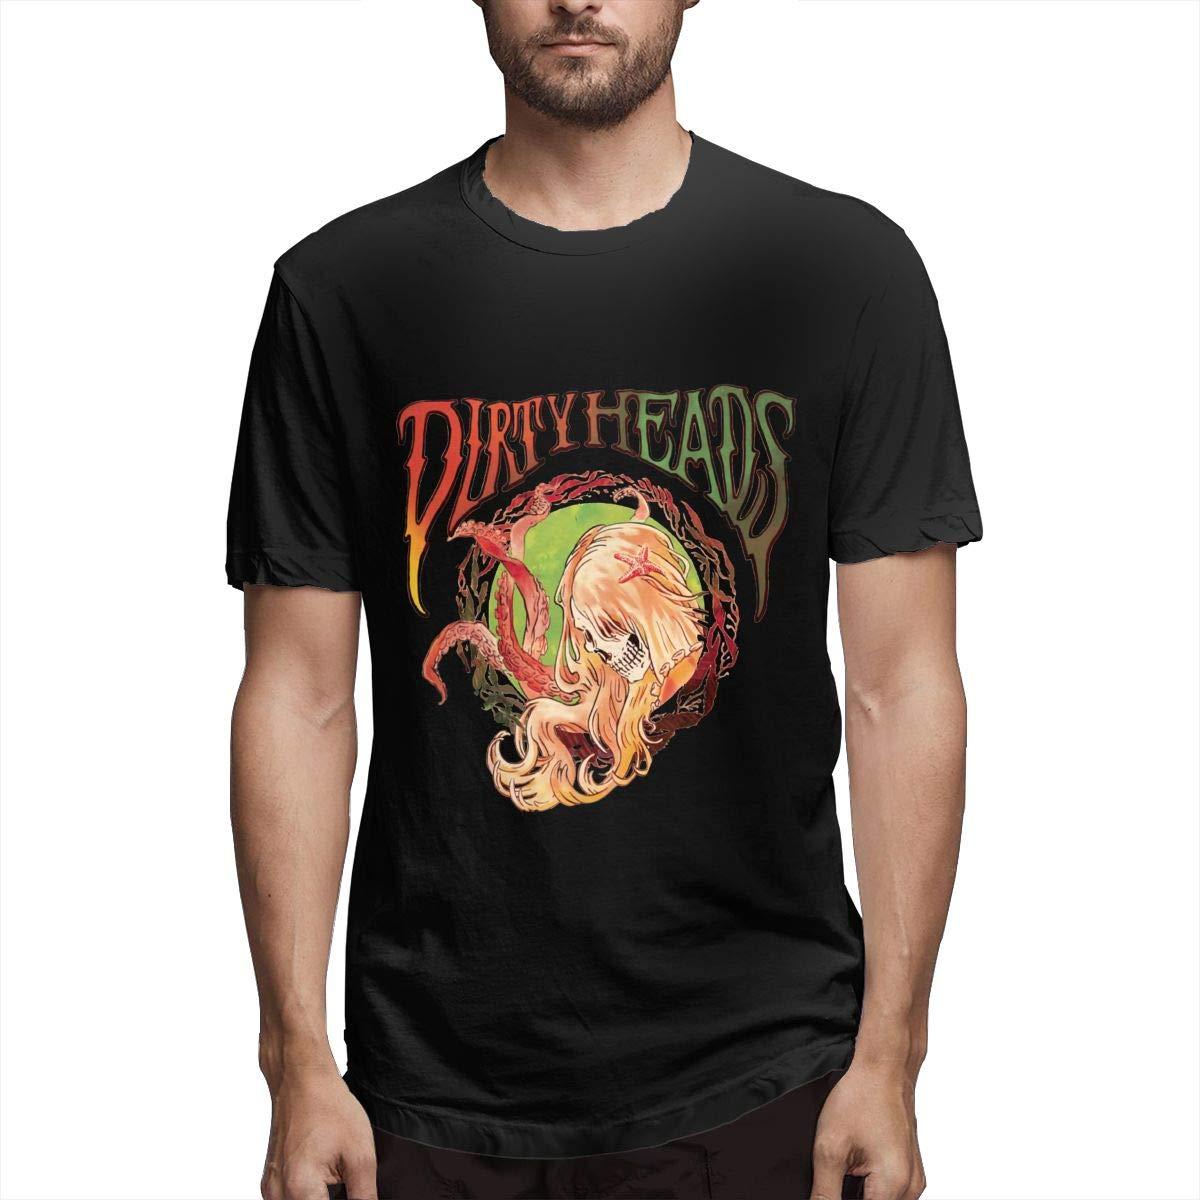 XiteSima Dirty Heads Men Short Sleeves T Shirt Classic Soft Crew Neck T Shirts